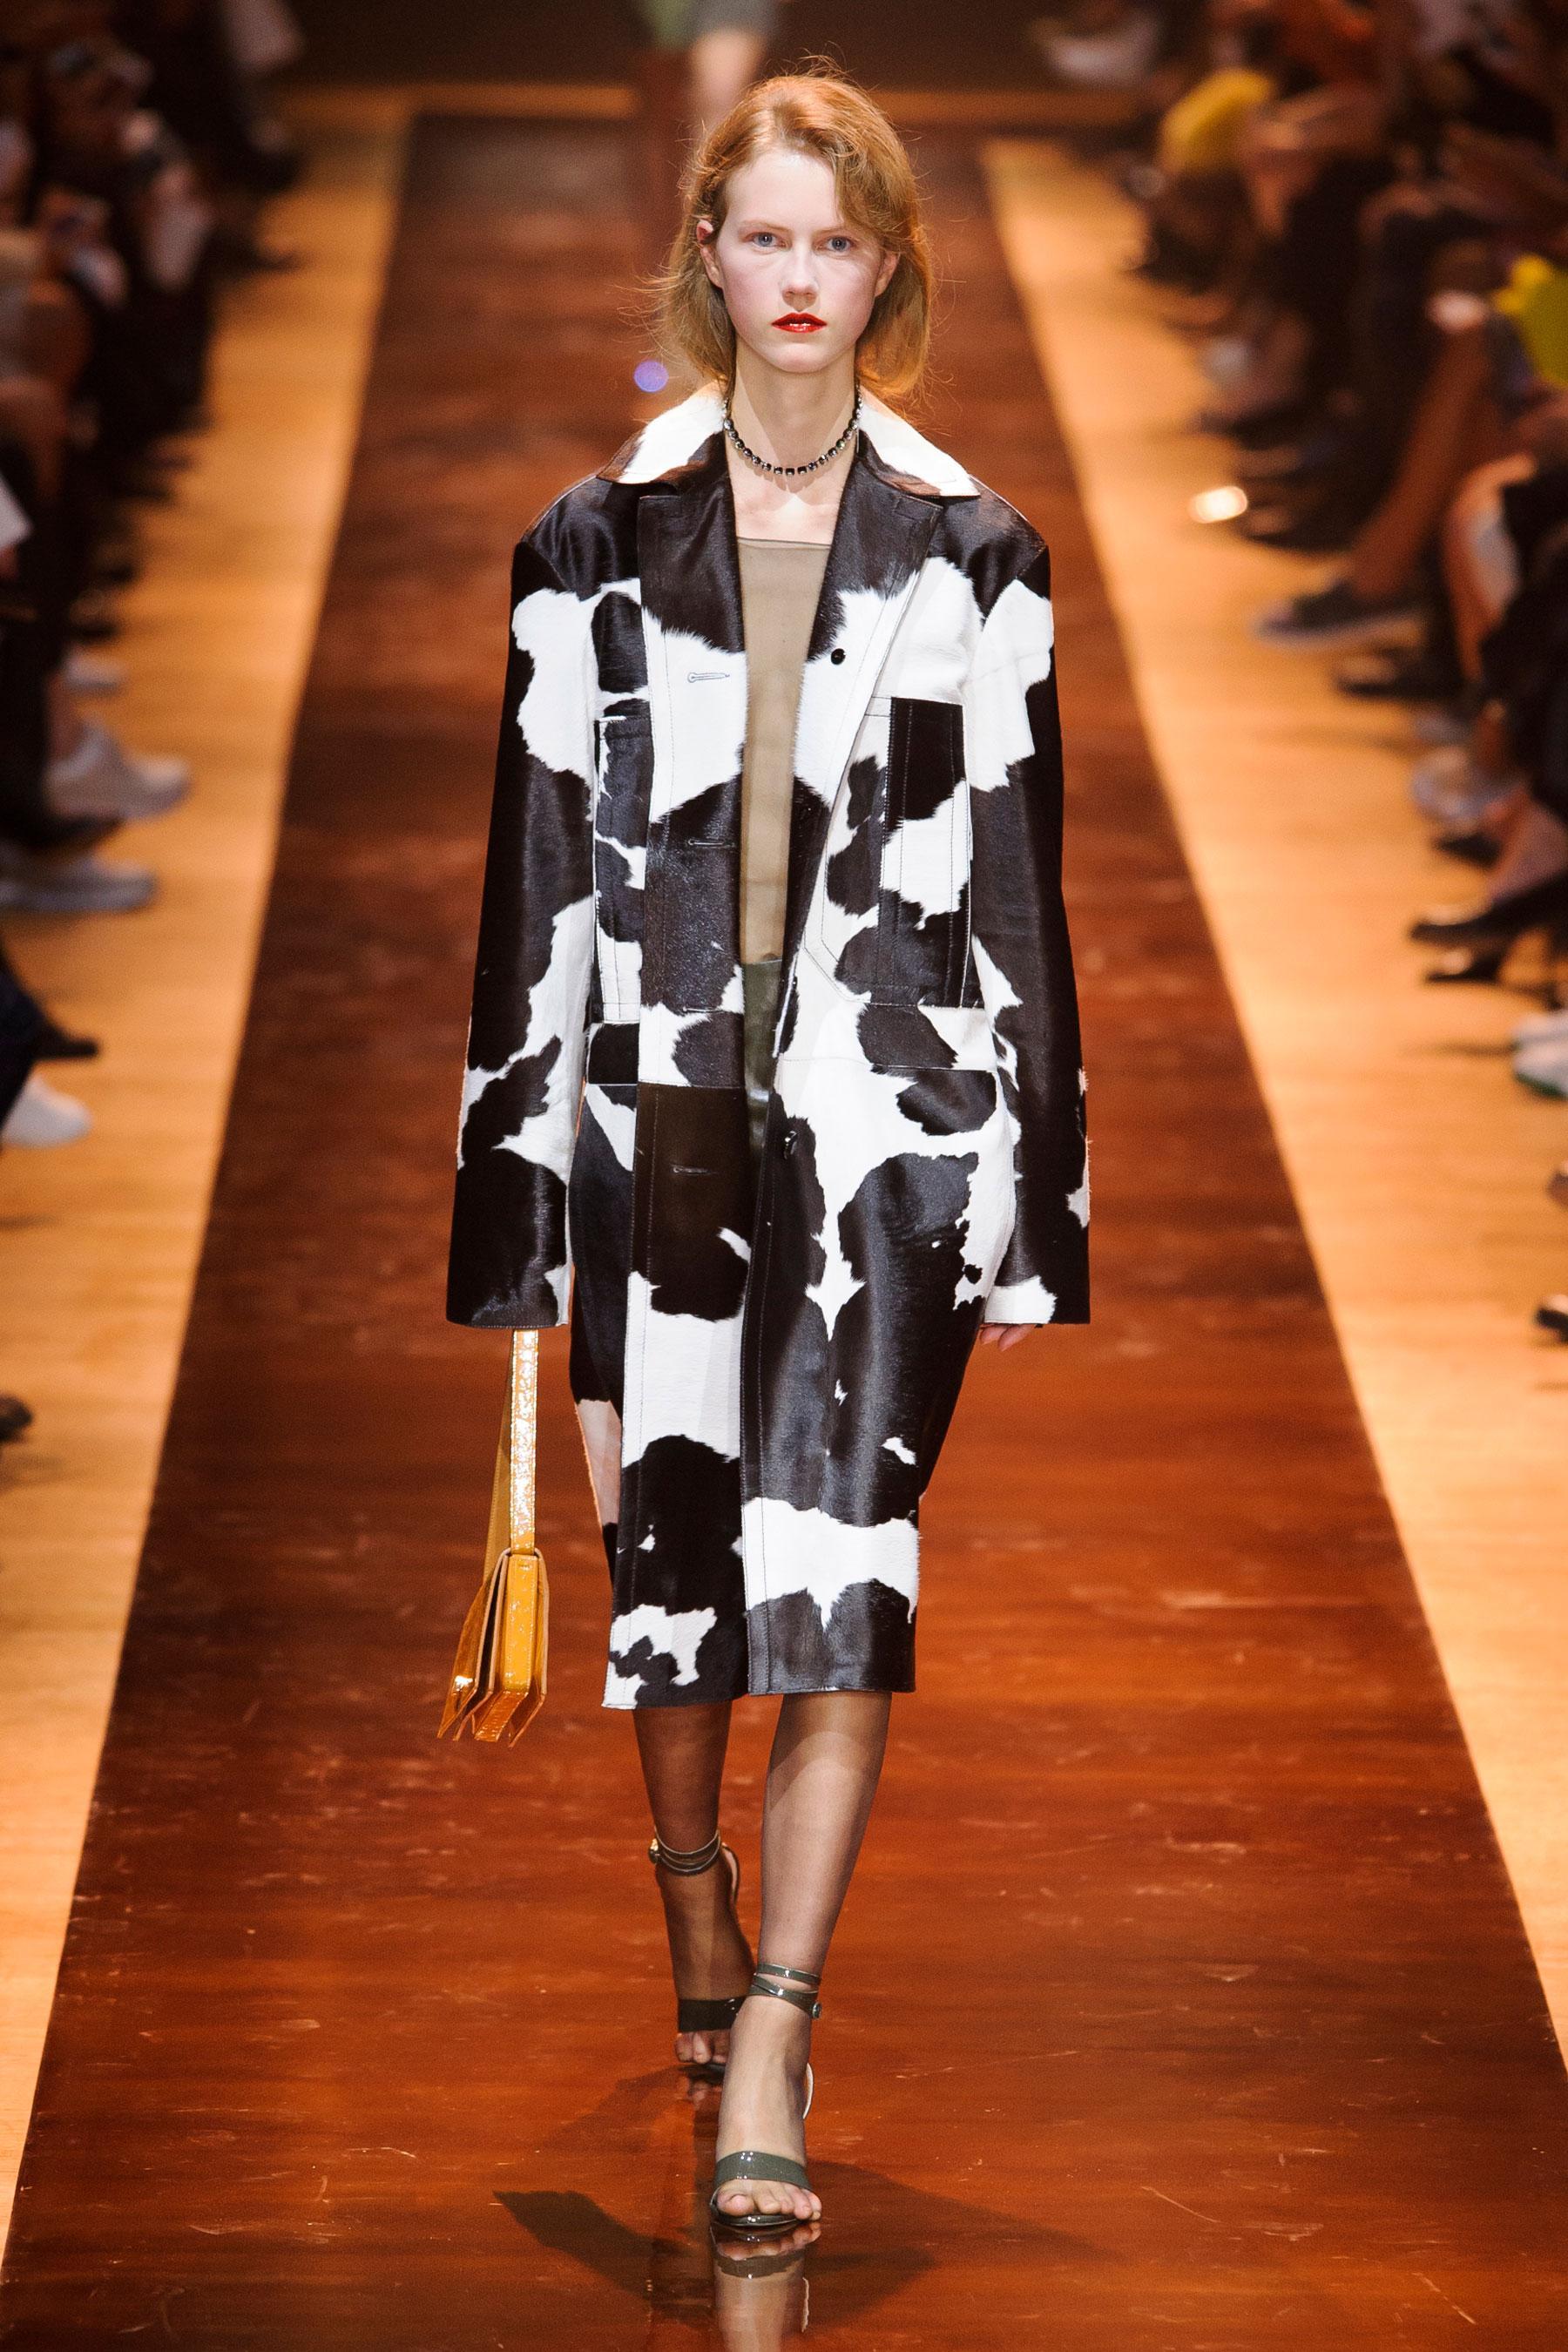 8ba7d17e6a Défilé Nina Ricci Printemps-été 2016 Prêt-à-porter - Madame Figaro